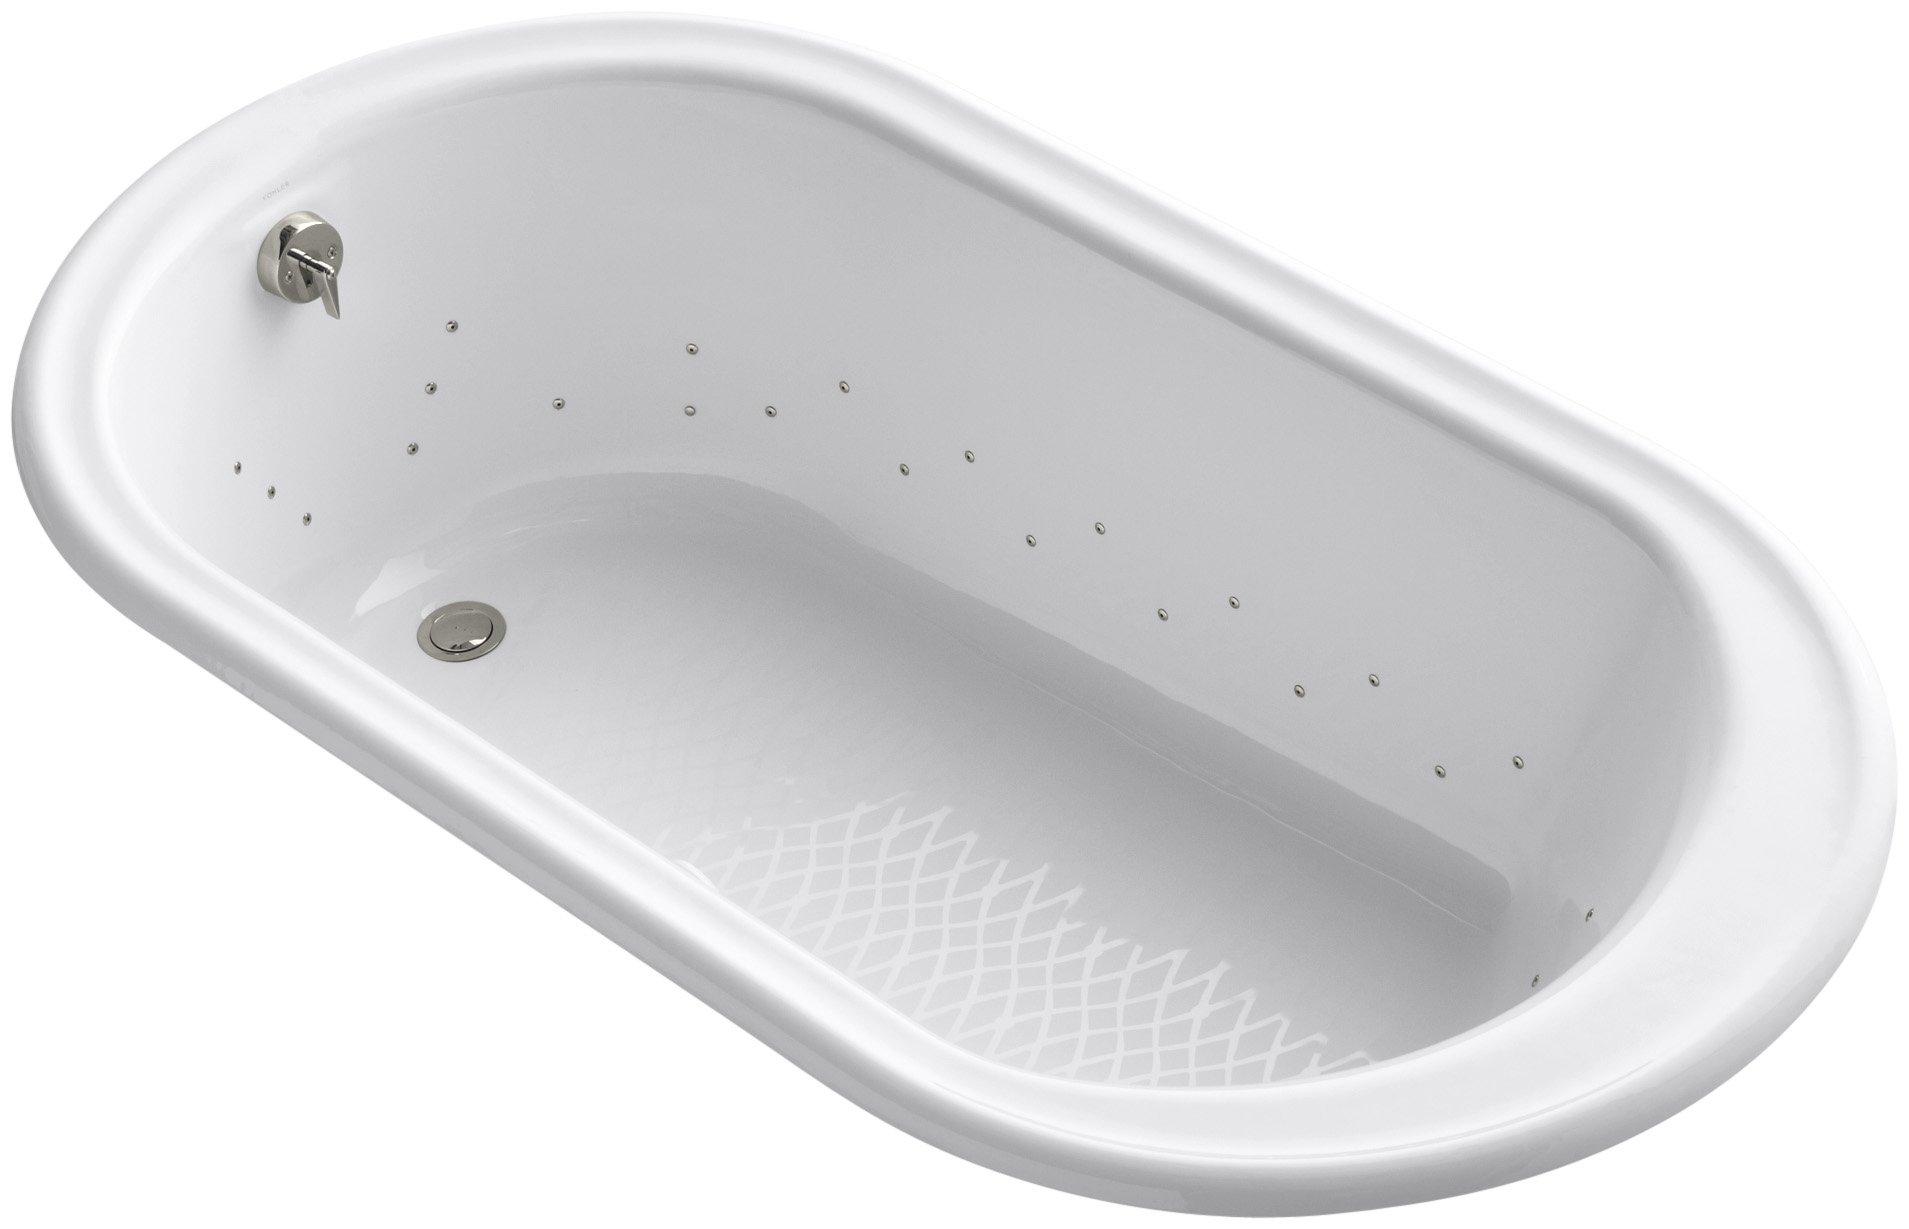 Kohler K-712-GSN-0 Iron Works Bubblemassage 5.5Ft Bath with Vibrant Polished Nickel Jet Color, White